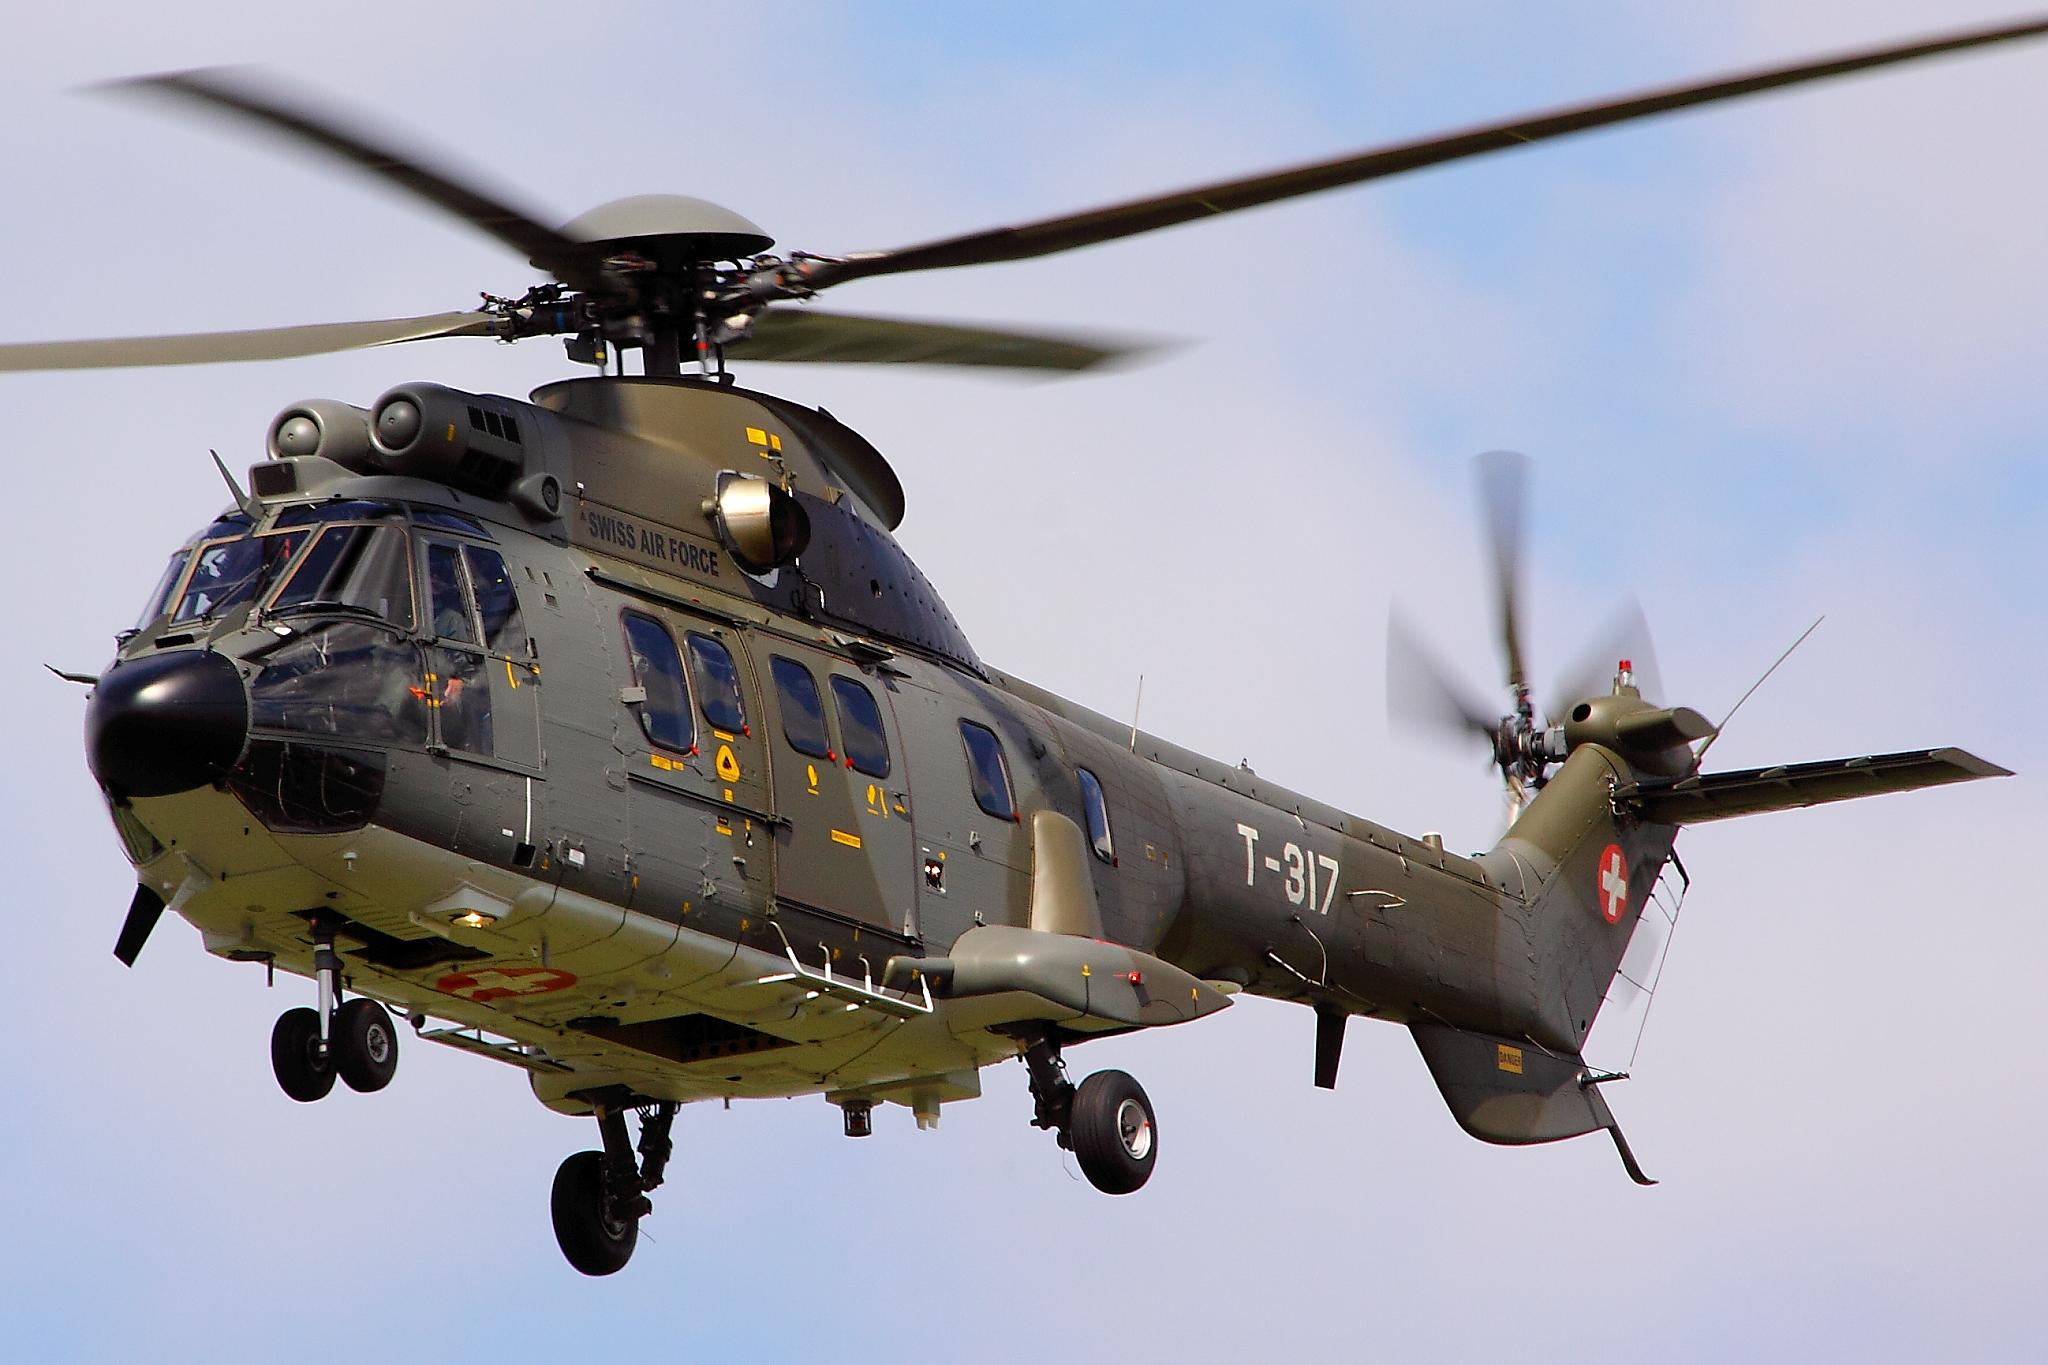 Elicottero Puma : Super puma display team wikiwand